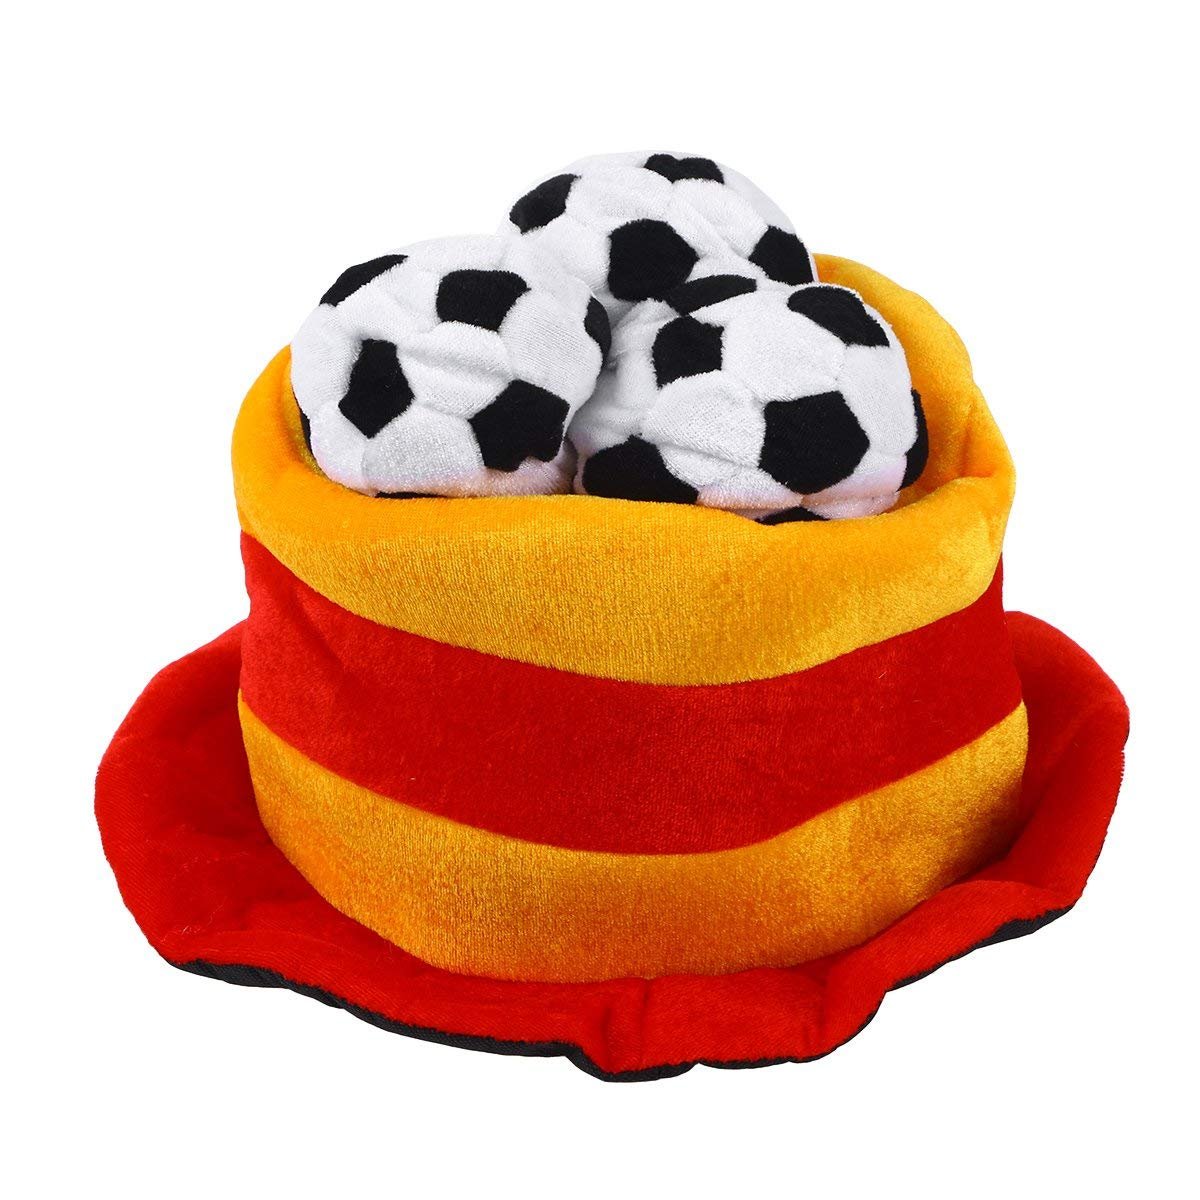 6b947a16a0a Get Quotations · BESTOYARD Spain Flag Soccer Ball Party Hat Cap 2018 World  Cup Football Fan Hat Cap